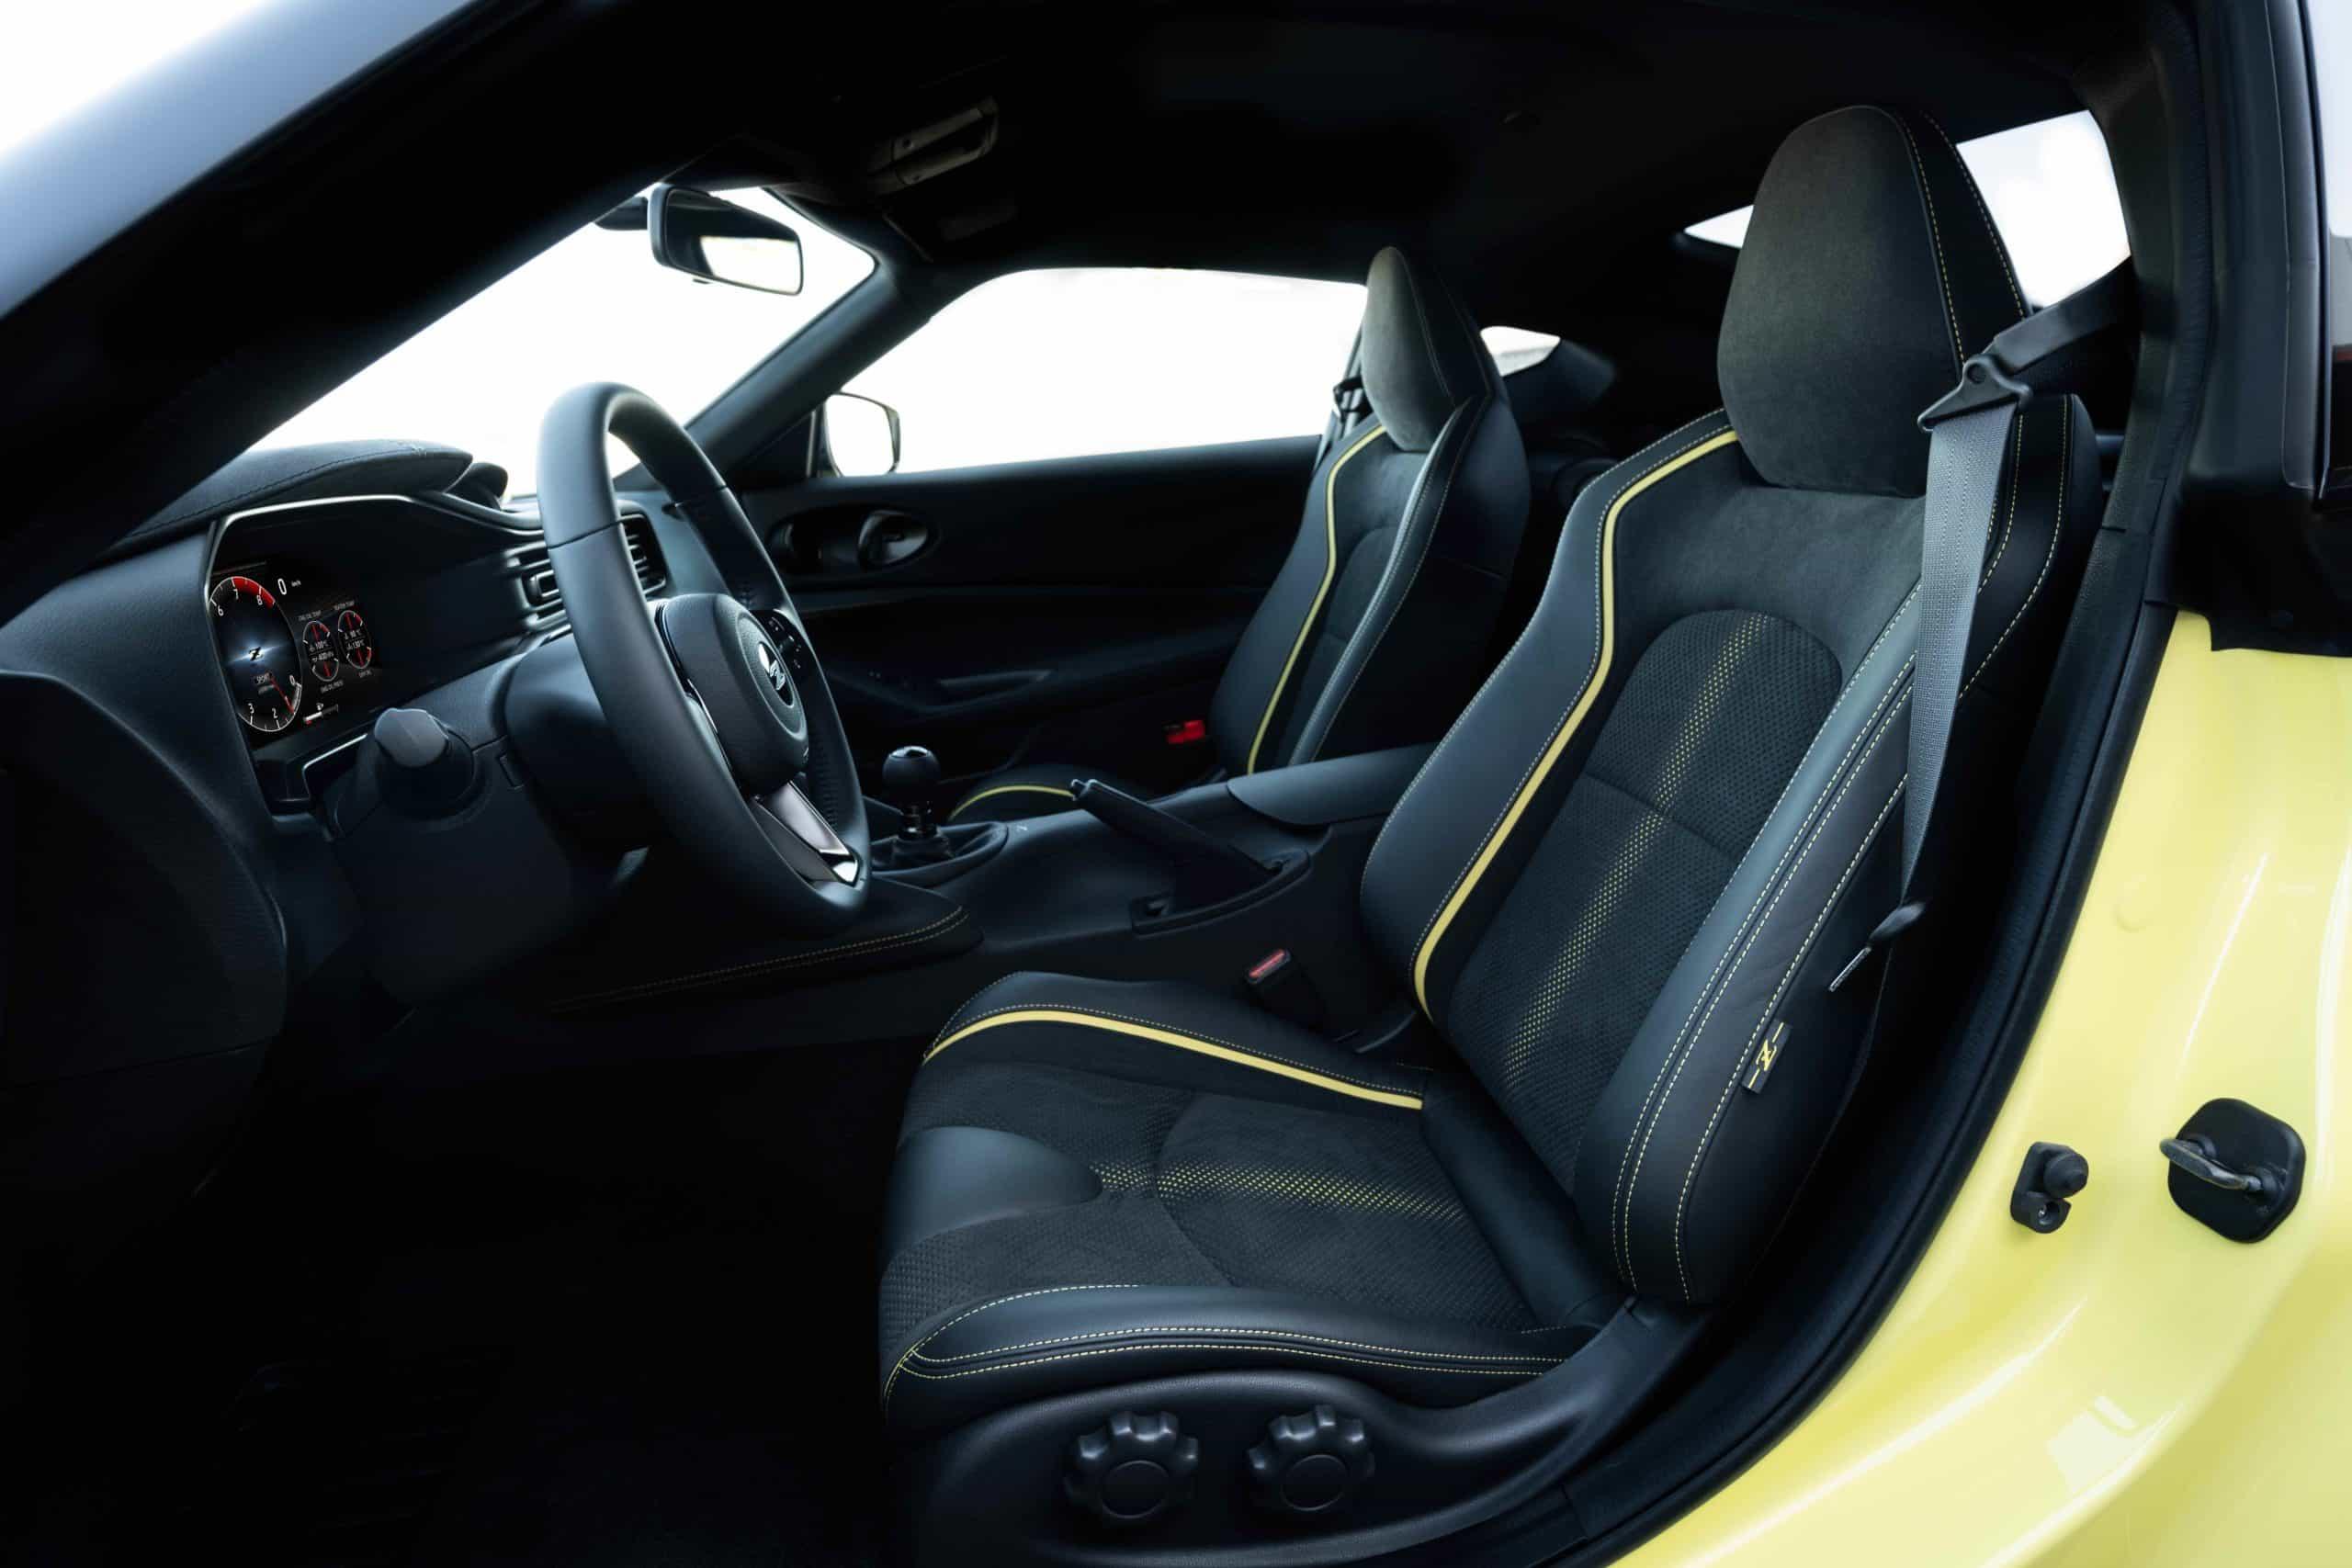 Nissan Z Proto interior